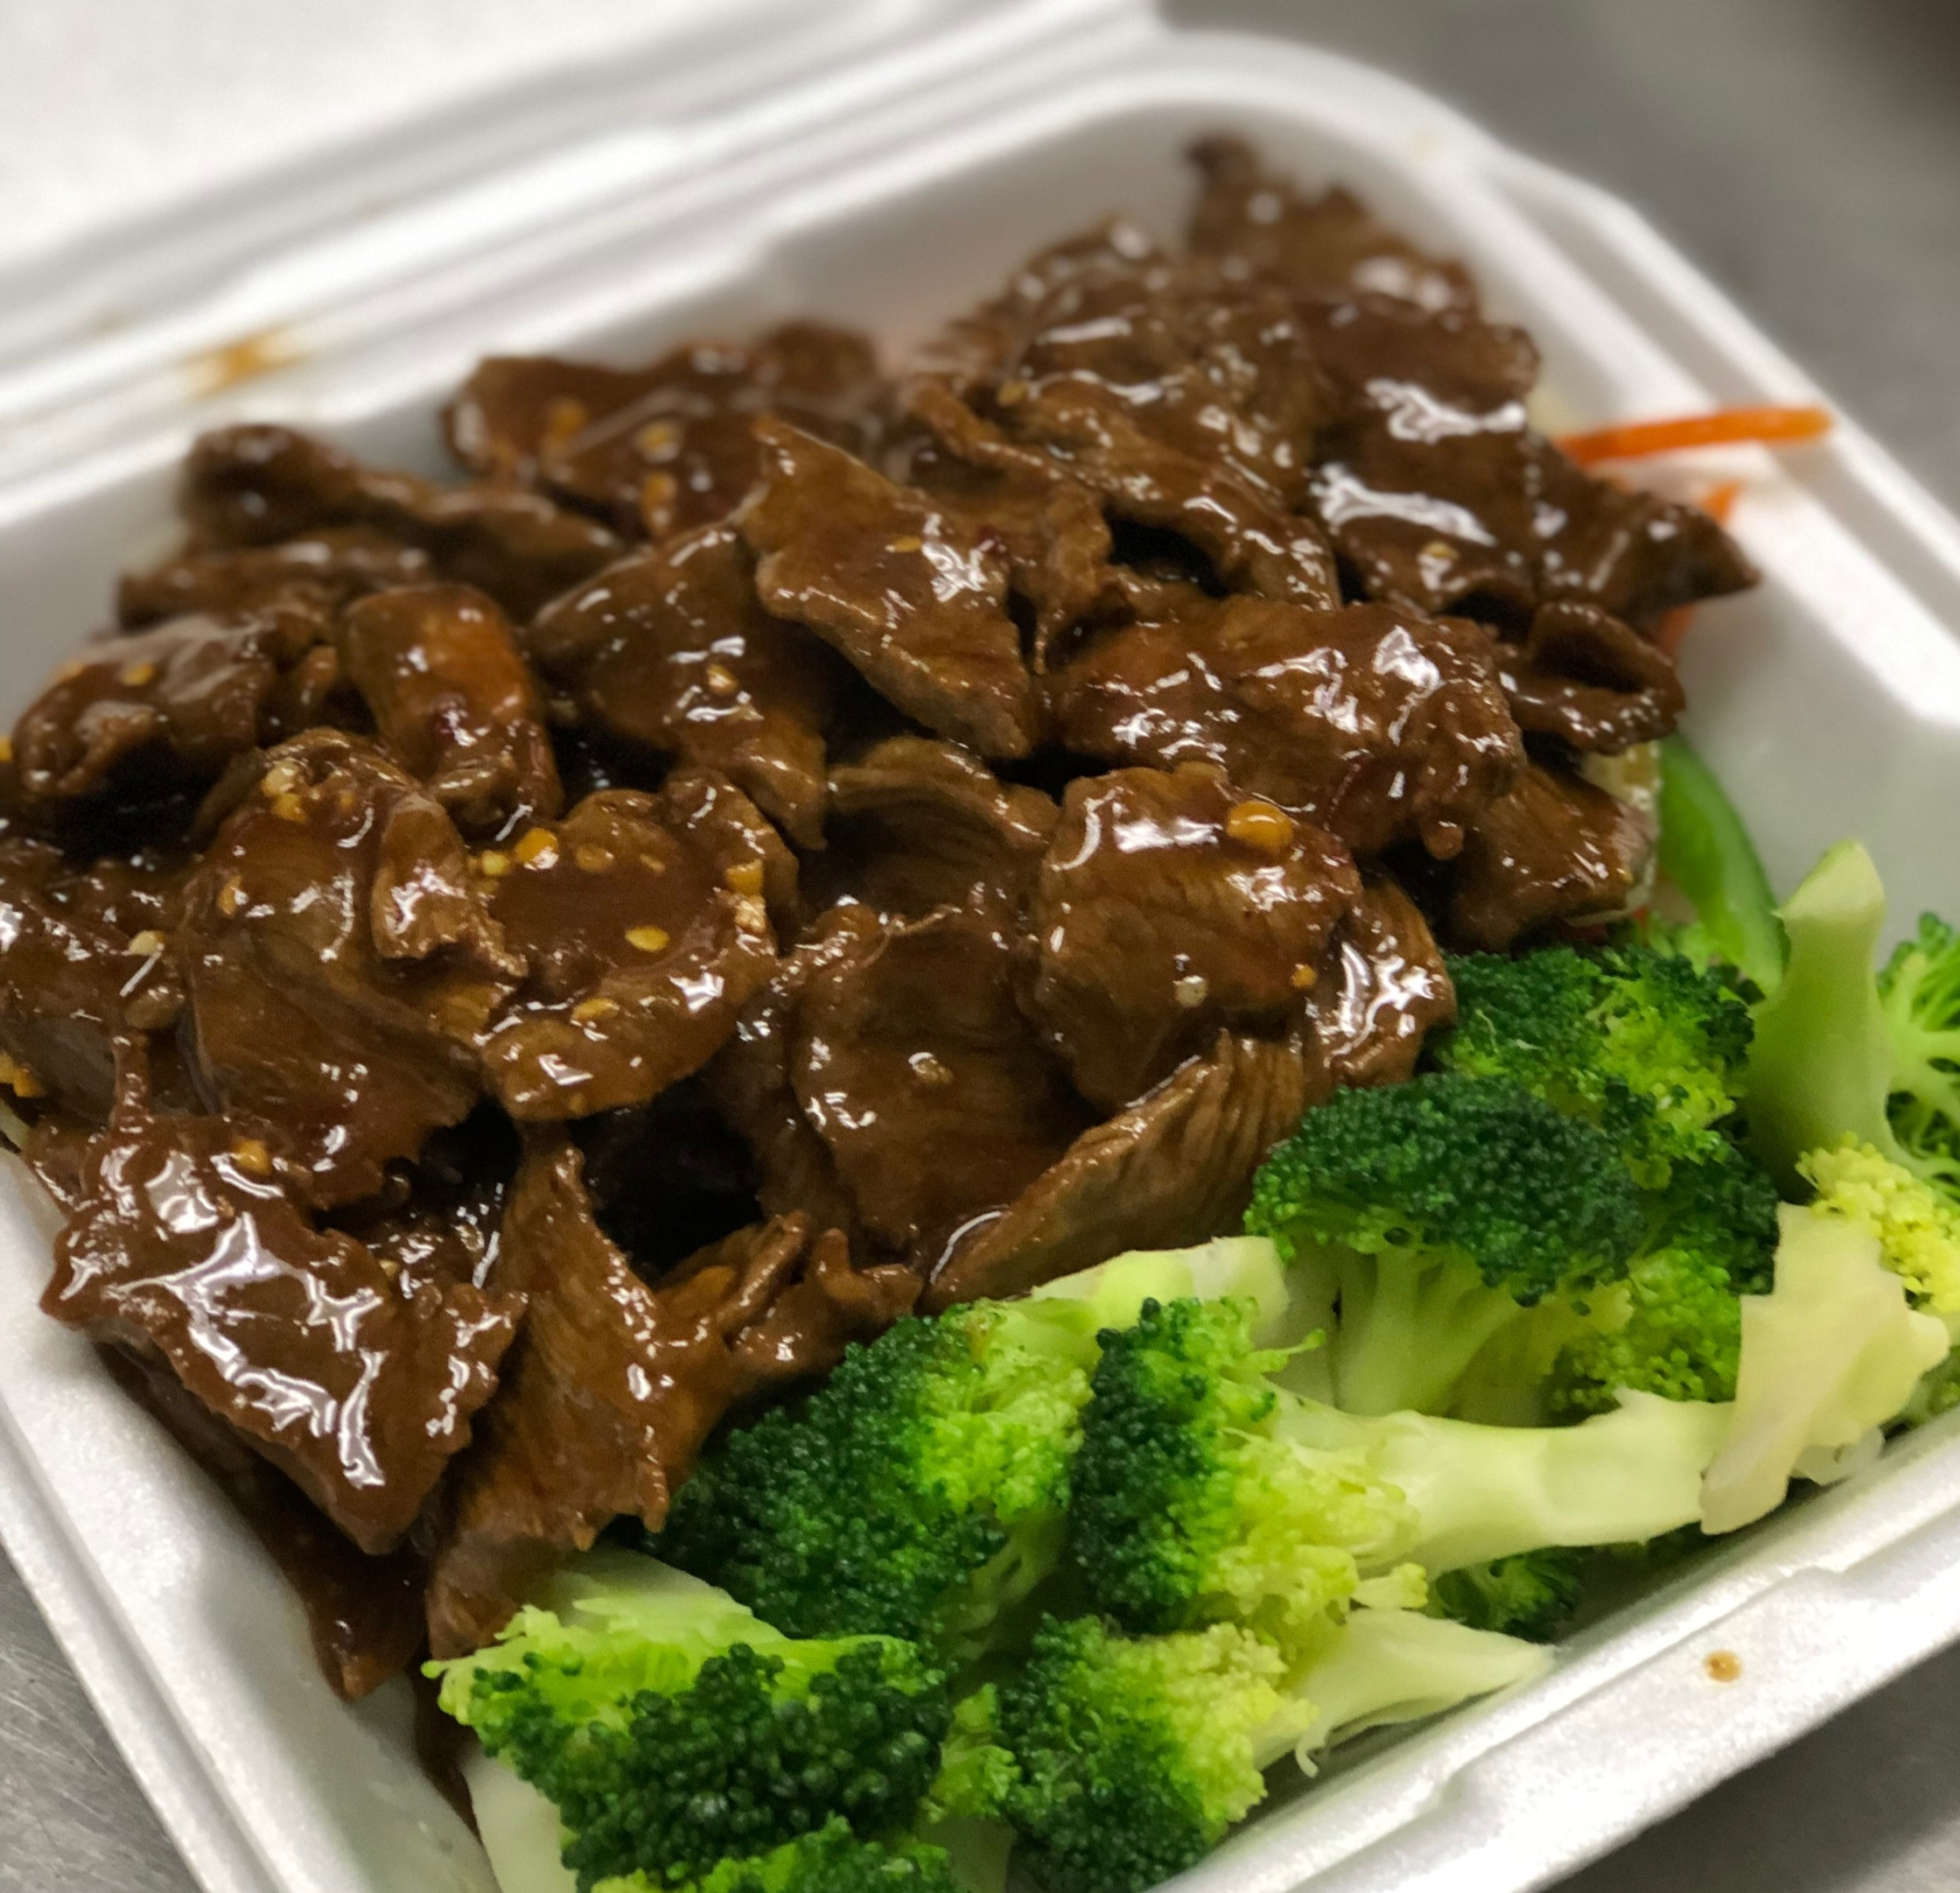 Chinese Kitchen Coventry >> Best Chinese Food Port Richey Florida | Li's Chinese Kitchen